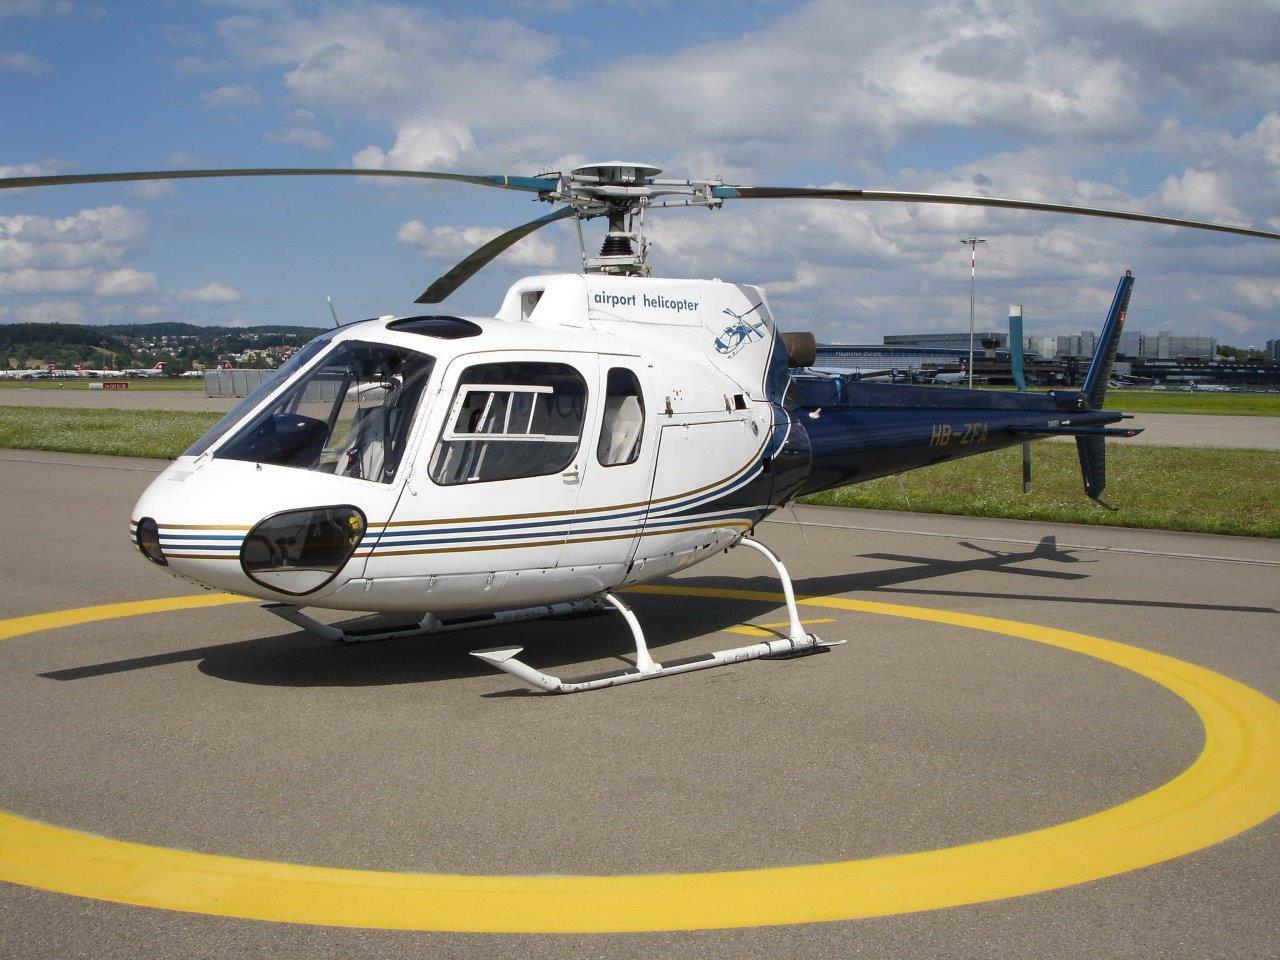 Hubschrauber Heliport Kilb Rametzberg